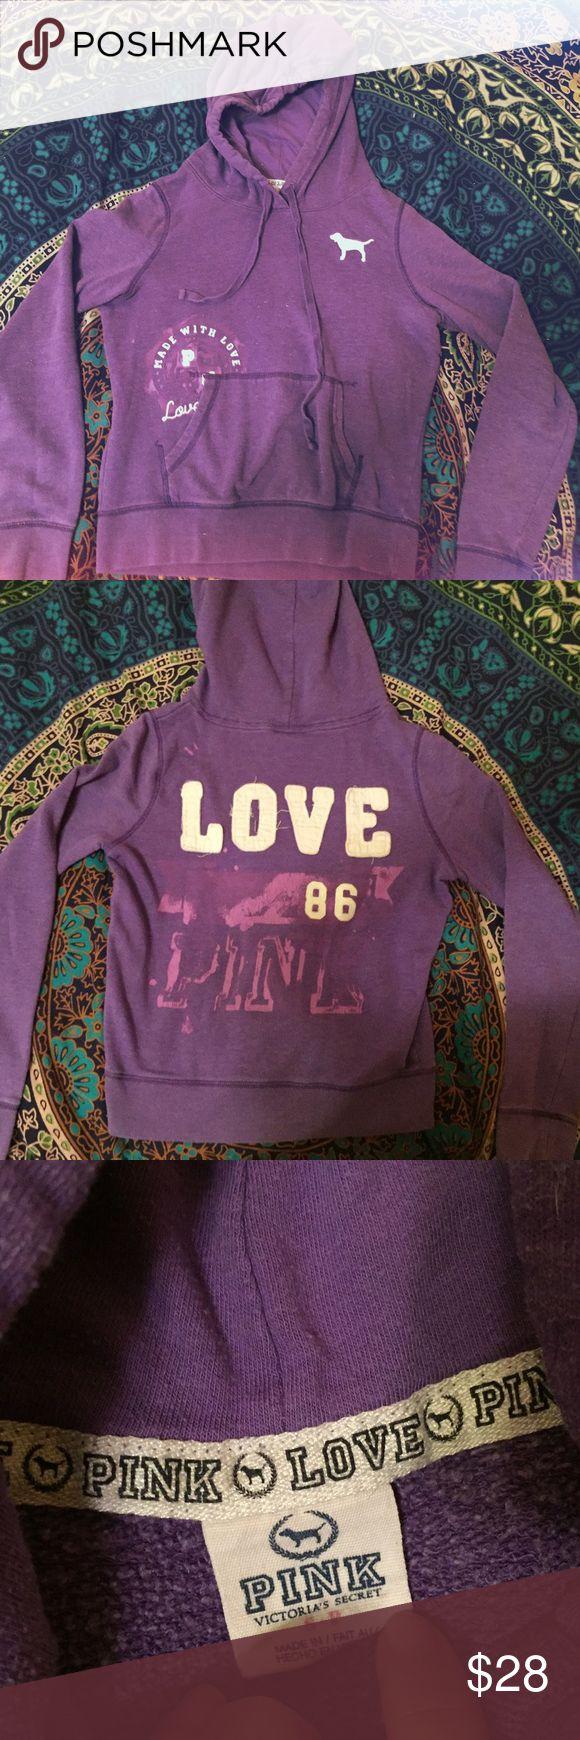 VS Pink Purple Hoodie Victoria's Secret Pink purple hoodie. Well loved but in wearable condition. Extra cozy! ⚠️FITS LIKE AN XS⚠️ One of my favorite sweatshirts ever. Enjoy!! PINK Victoria's Secret Tops Sweatshirts & Hoodies